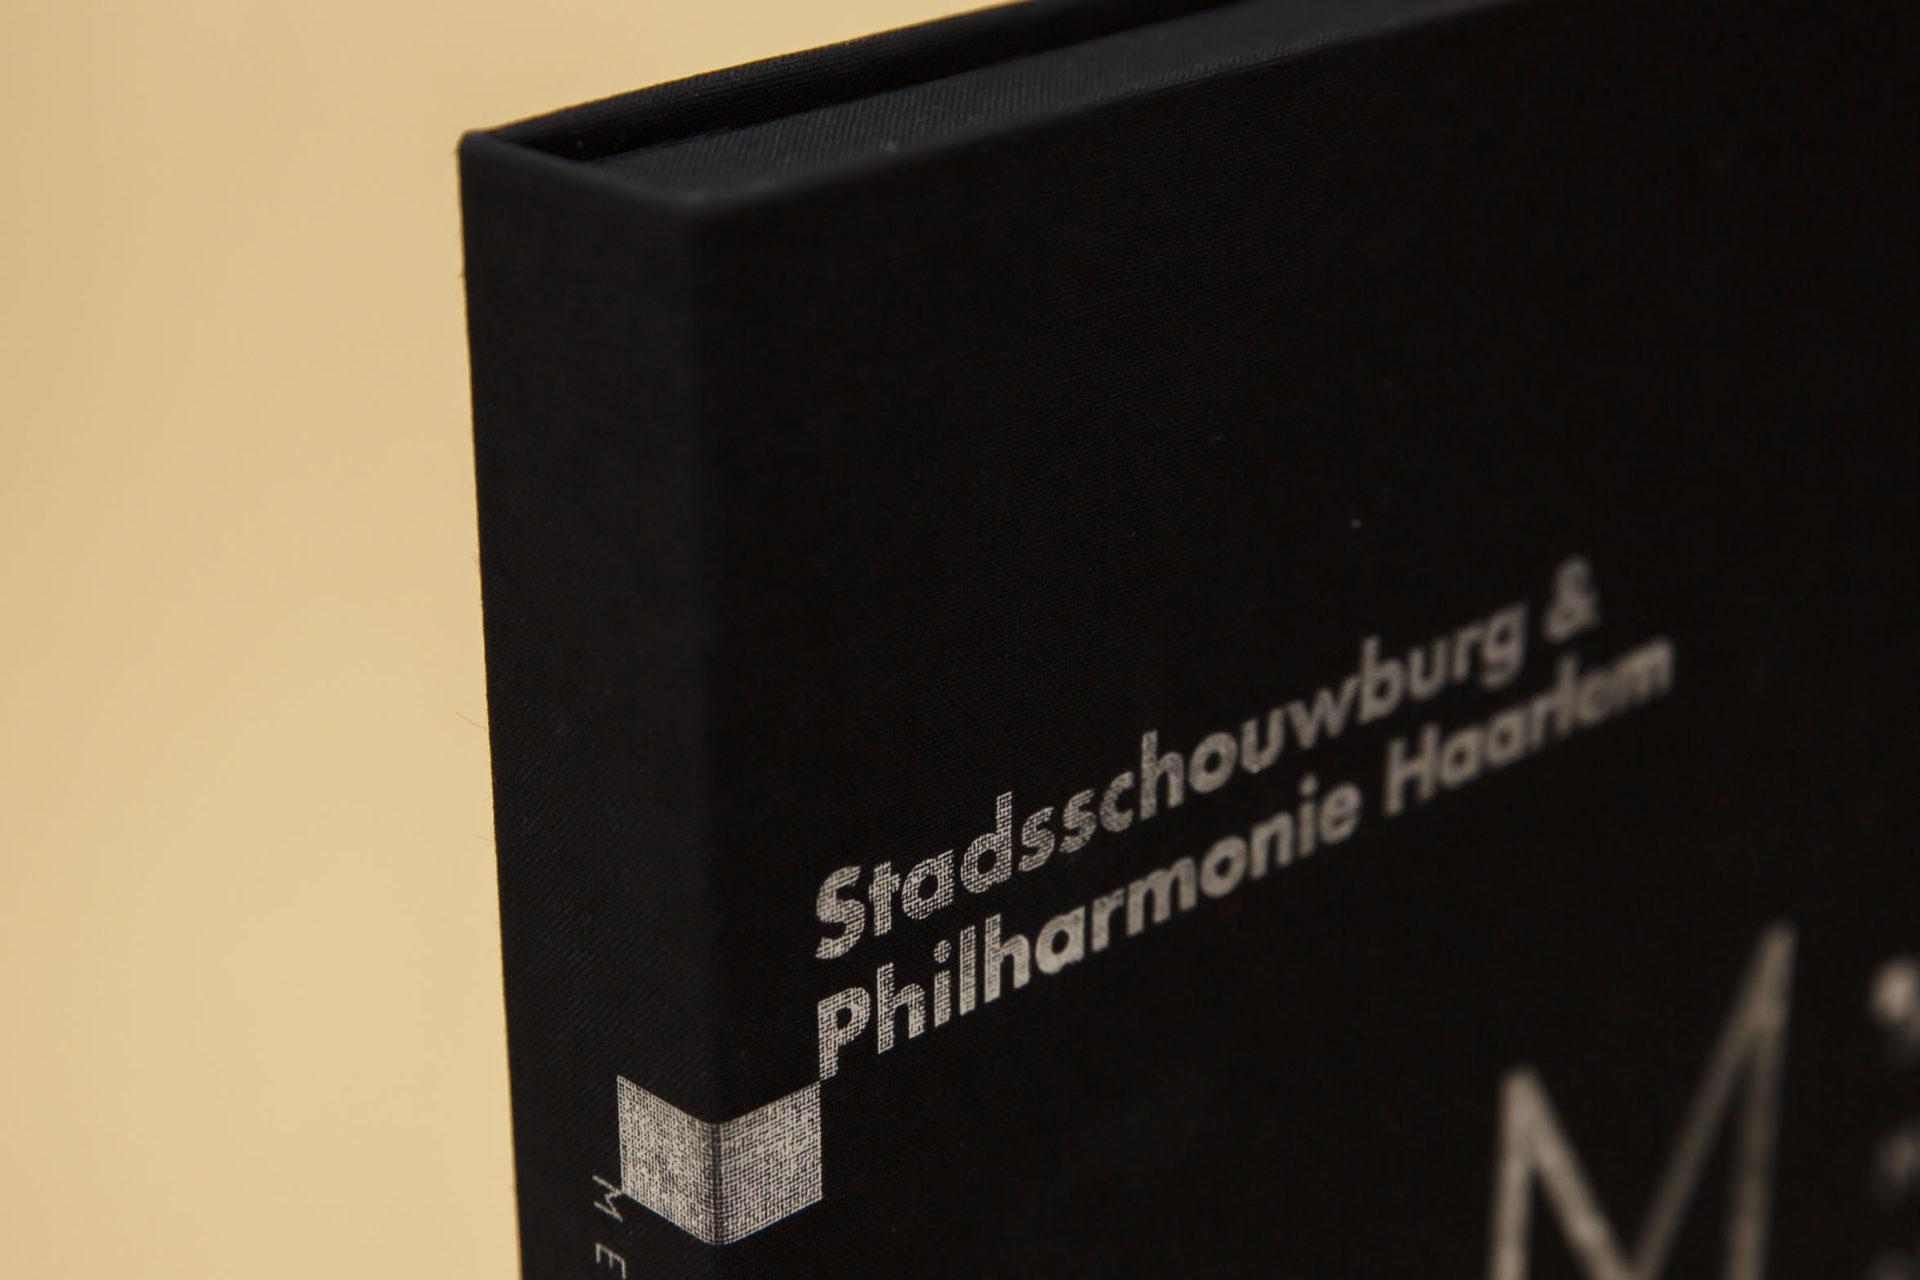 Doosband  Stadsschouwburg & Philharmonie Haarlem